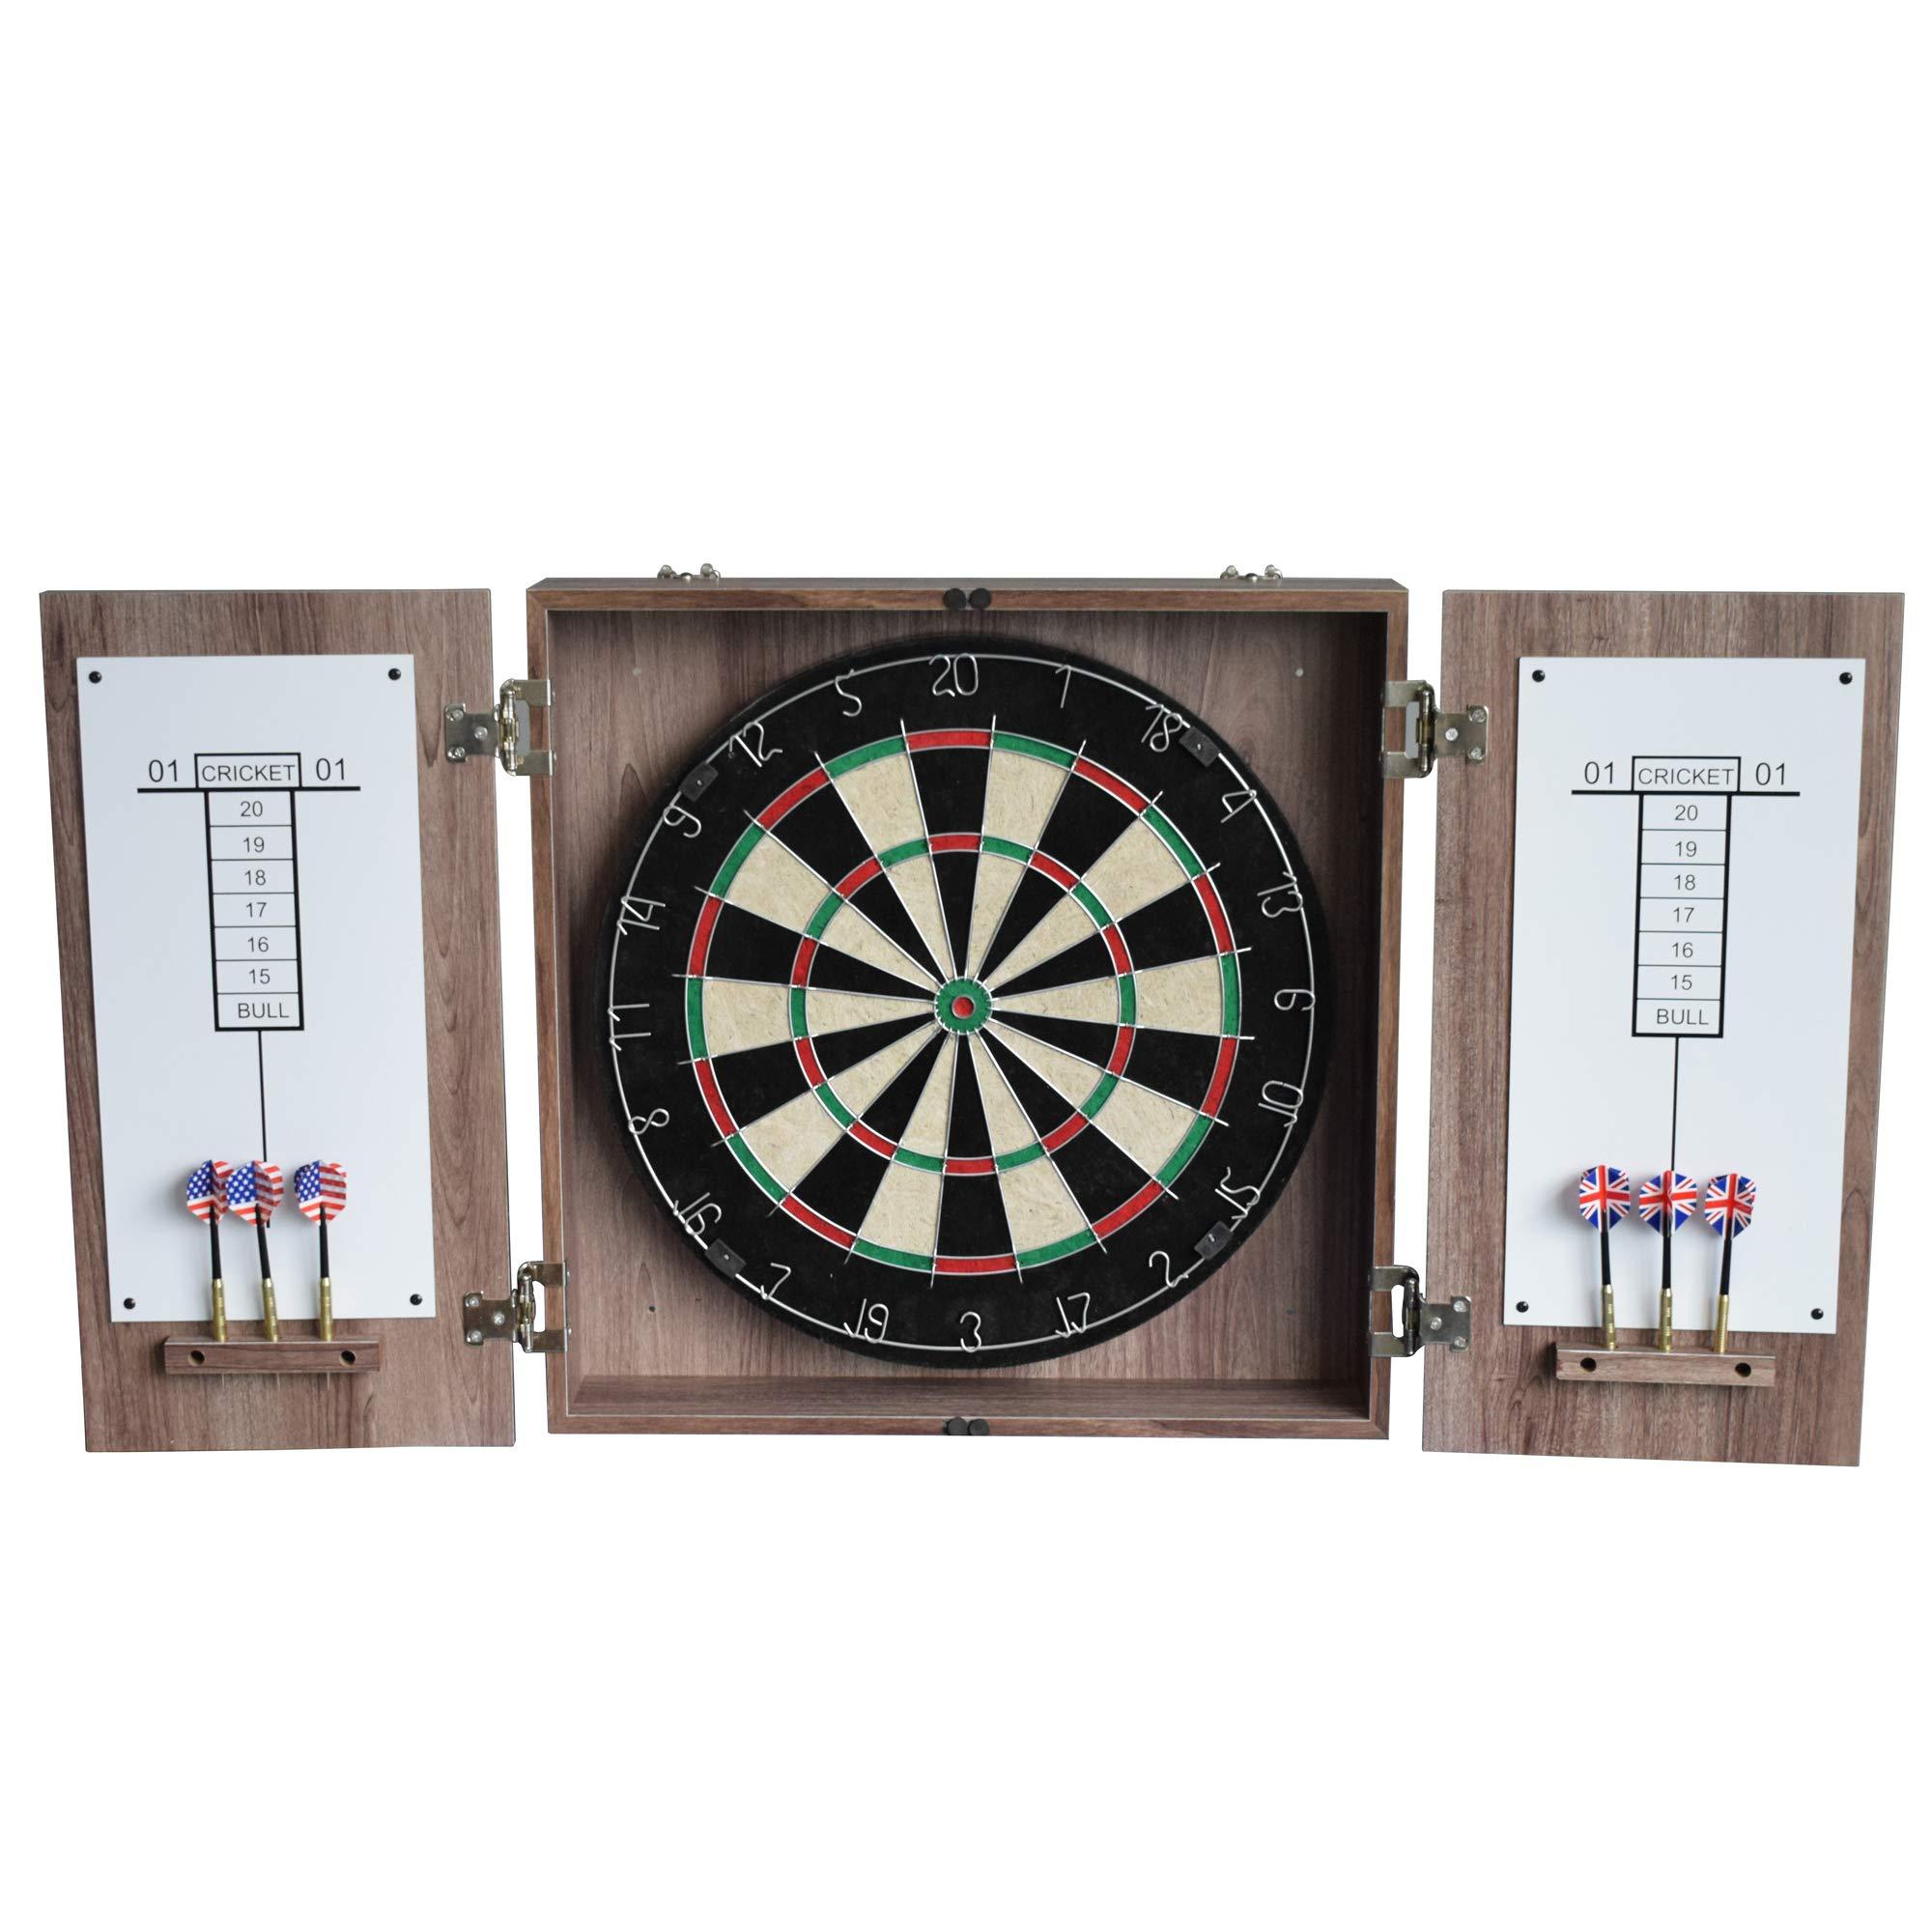 HATHAWAY Winchester Dartboard & Cabinet Set, Driftwood, 3.75'' L x 19.75'' W x 19.75'' H, Black